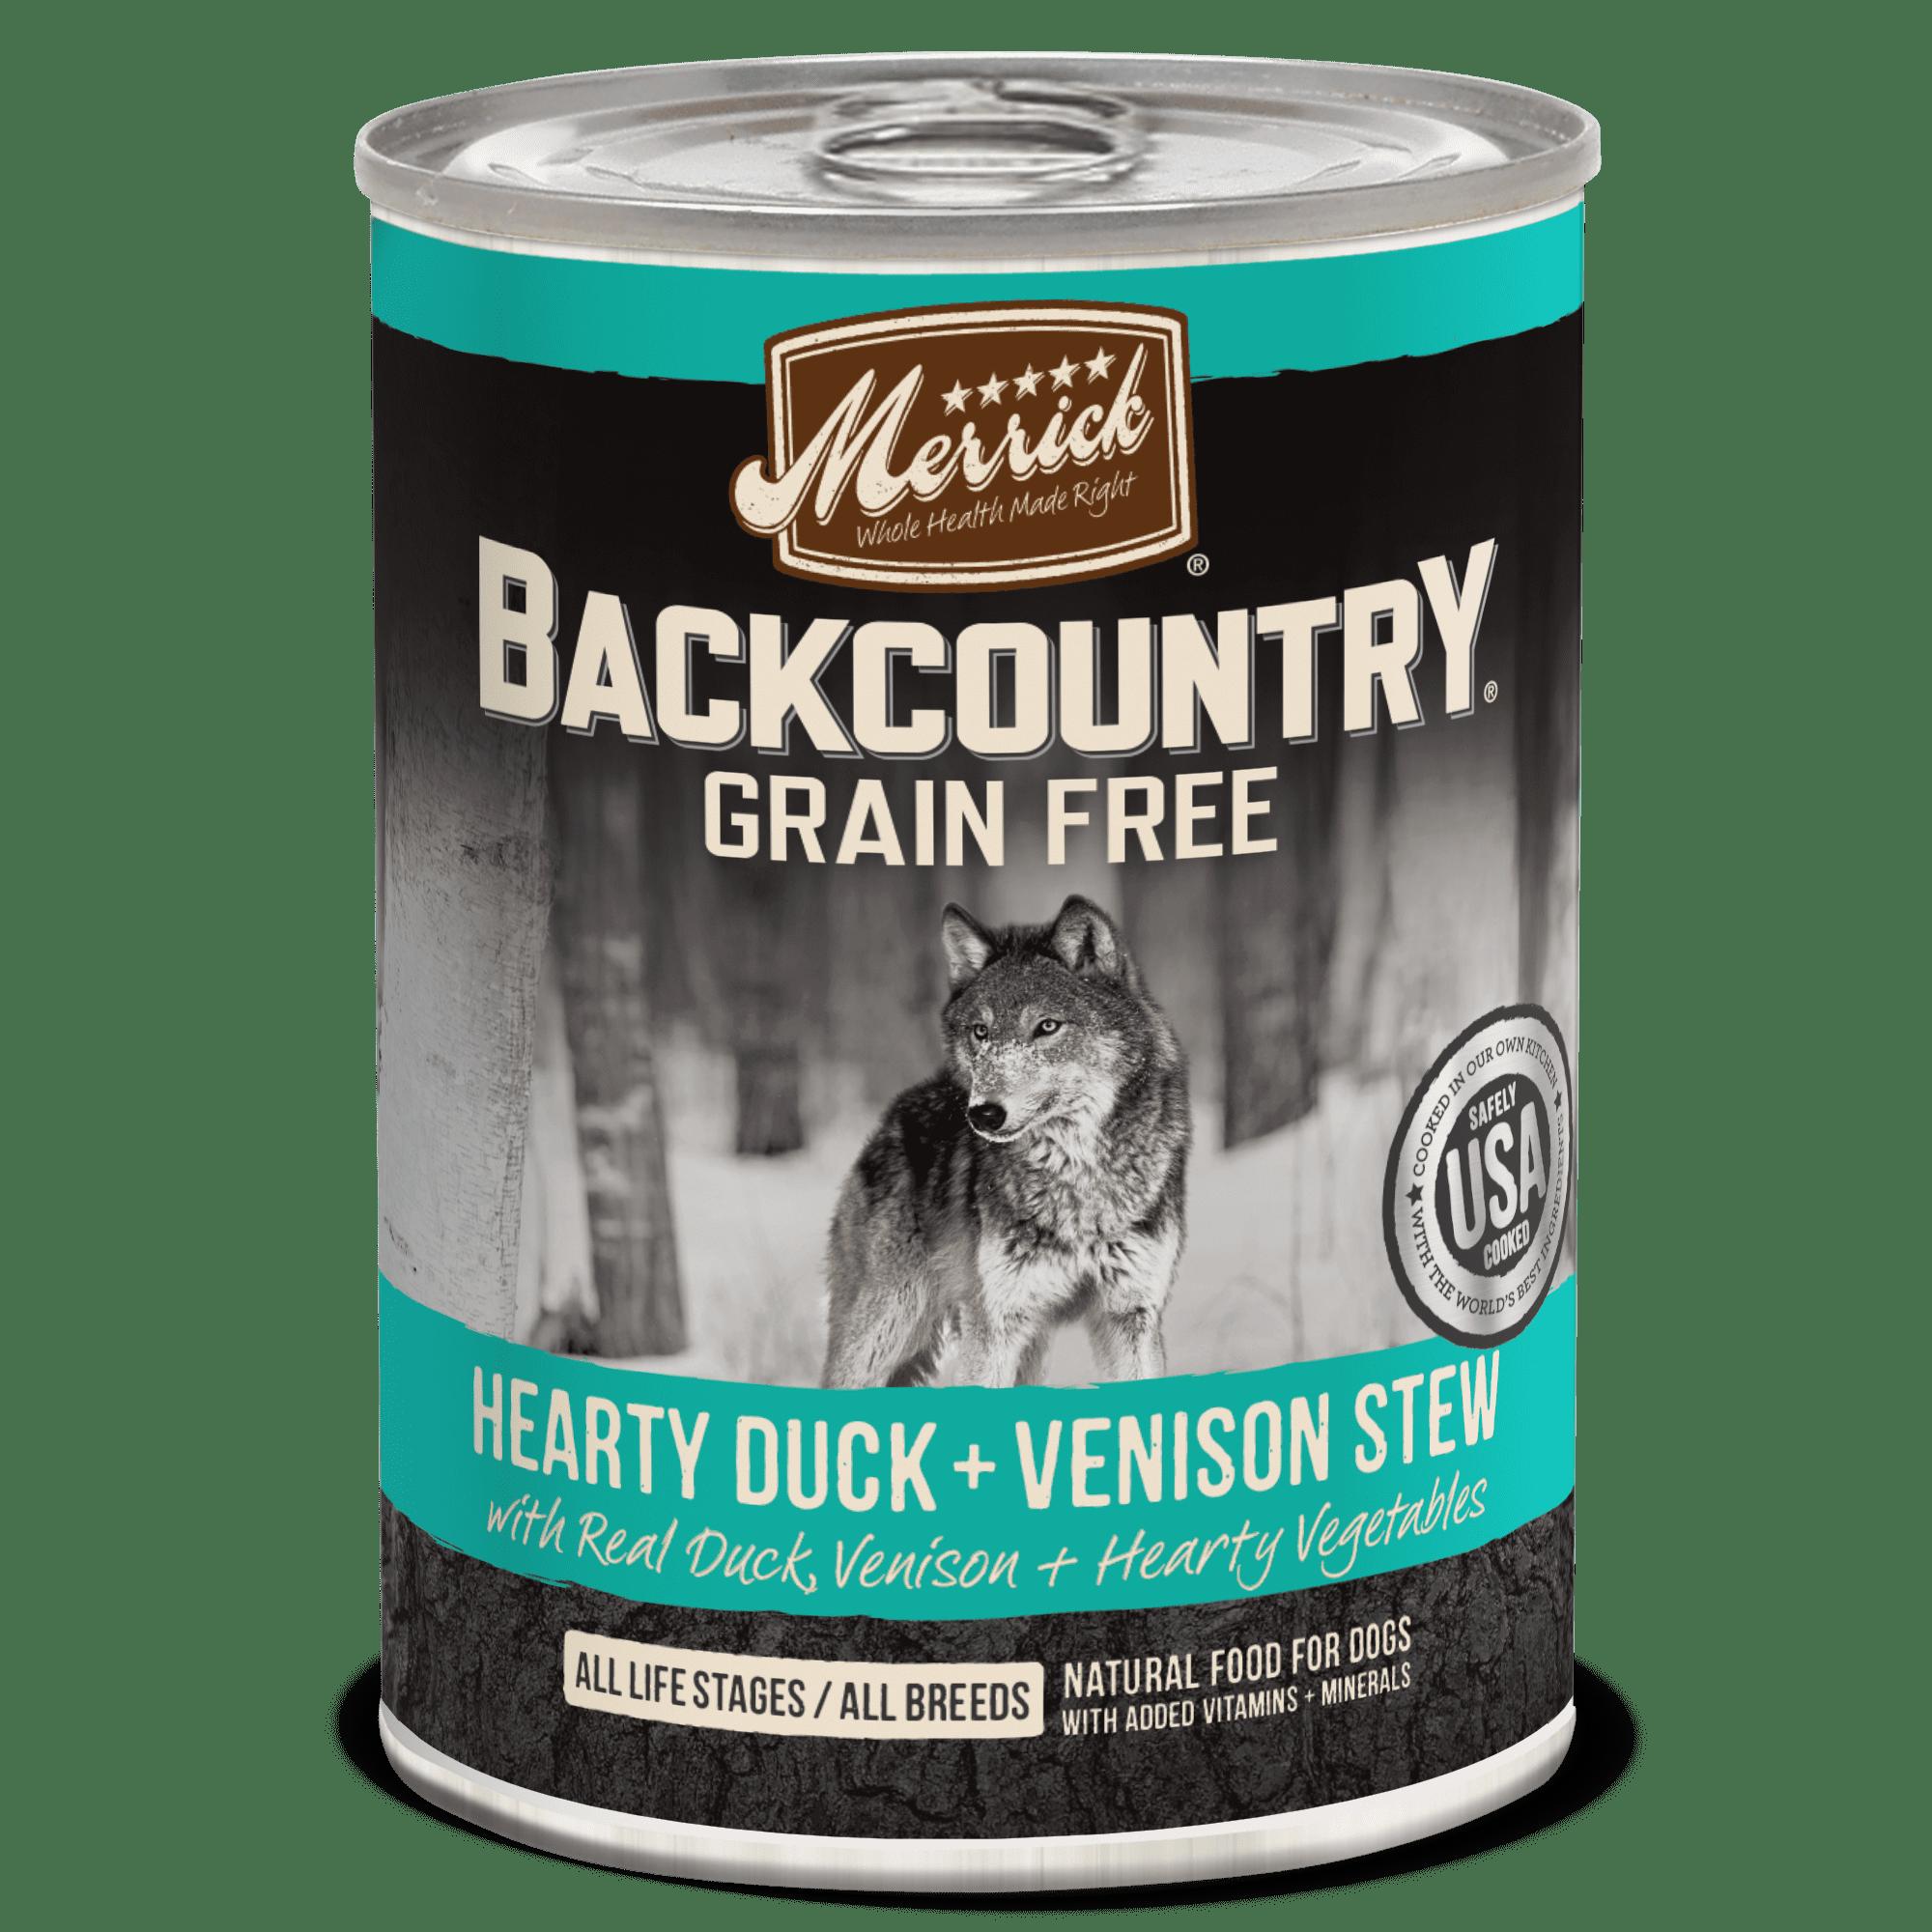 Merrick Backcountry Grain-Free Hearty Duck + Venison Stew Wet Dog Food, 12.7 oz, Case of 12